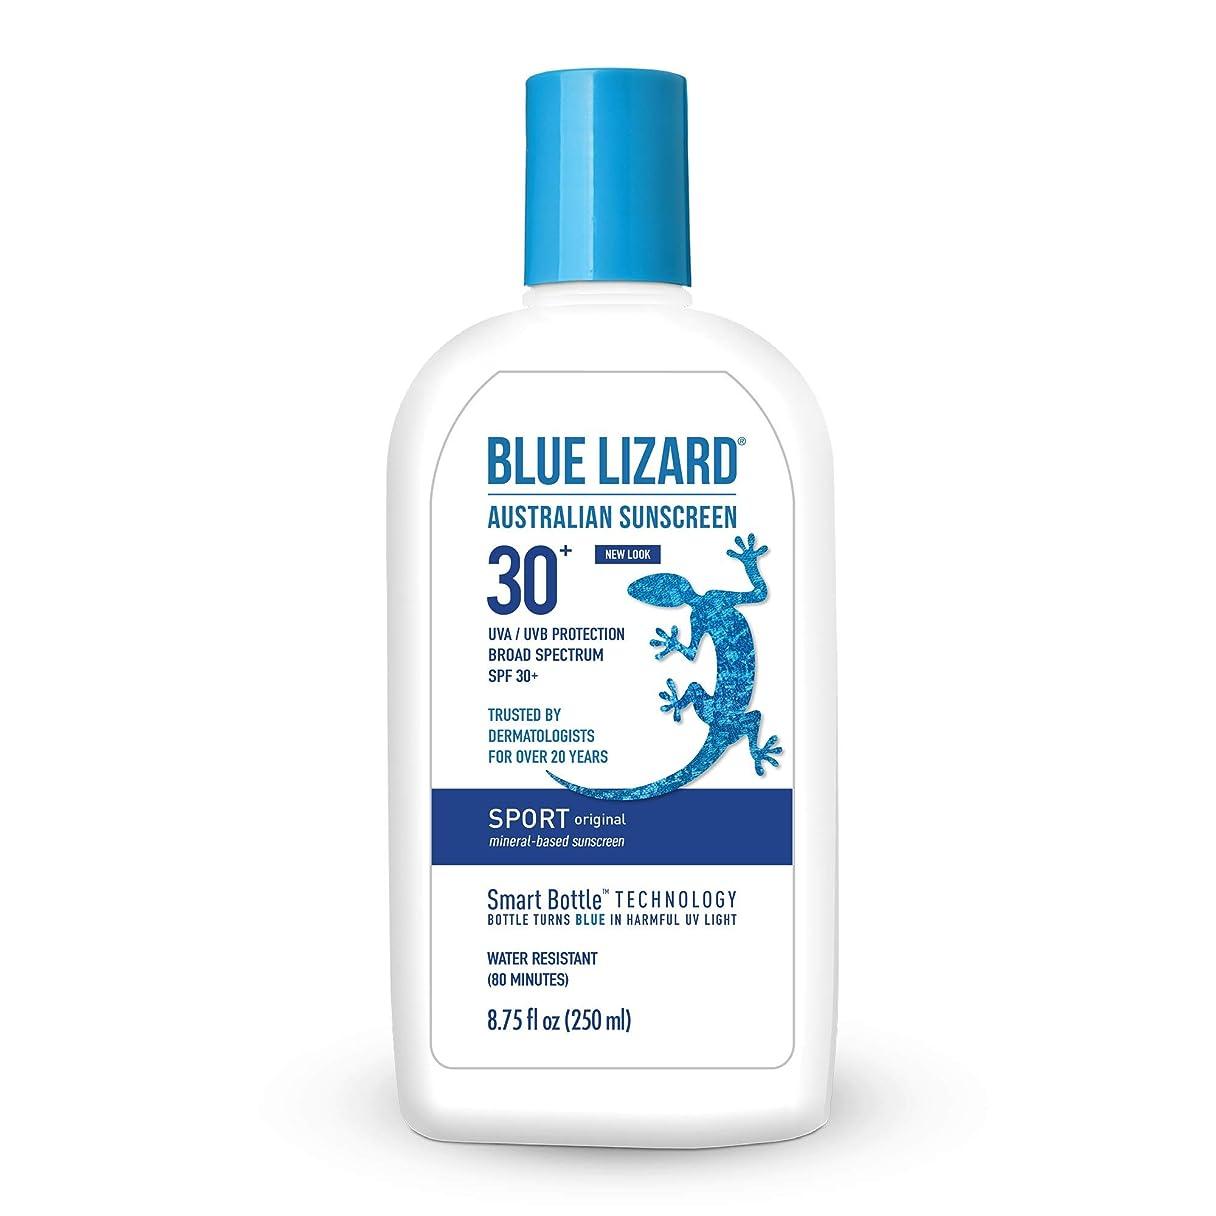 おとこ疲労地図Blue Lizard Australian SUNSCREEN SPF 30+, Sport SPF 30+ (8.75 oz) by Blue Lizard